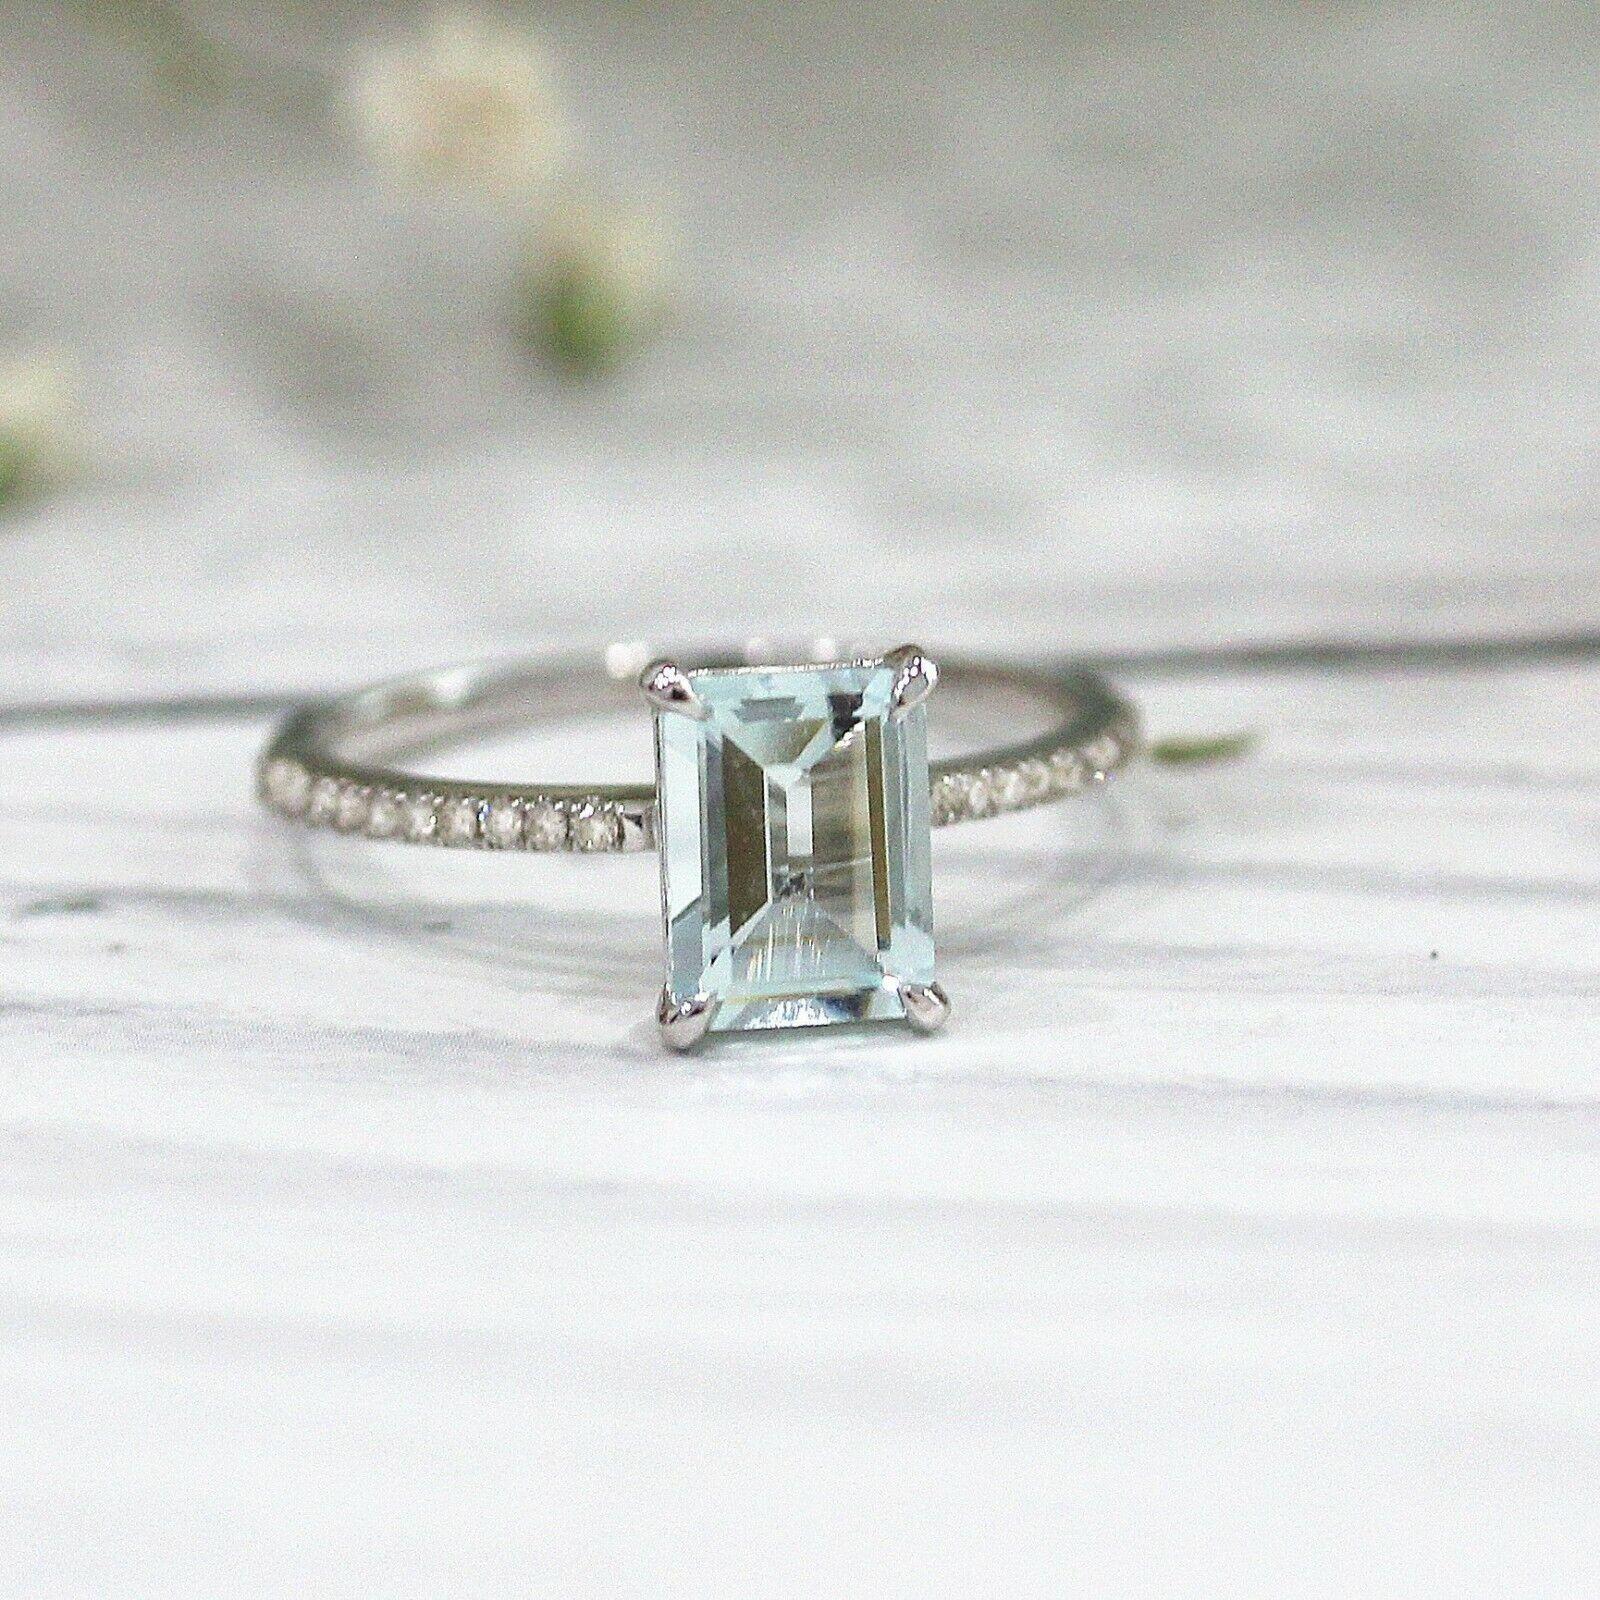 4Ct Emerald Cut Aquamarine Diamond Accents Solitaire Ring 14K White gold Finish